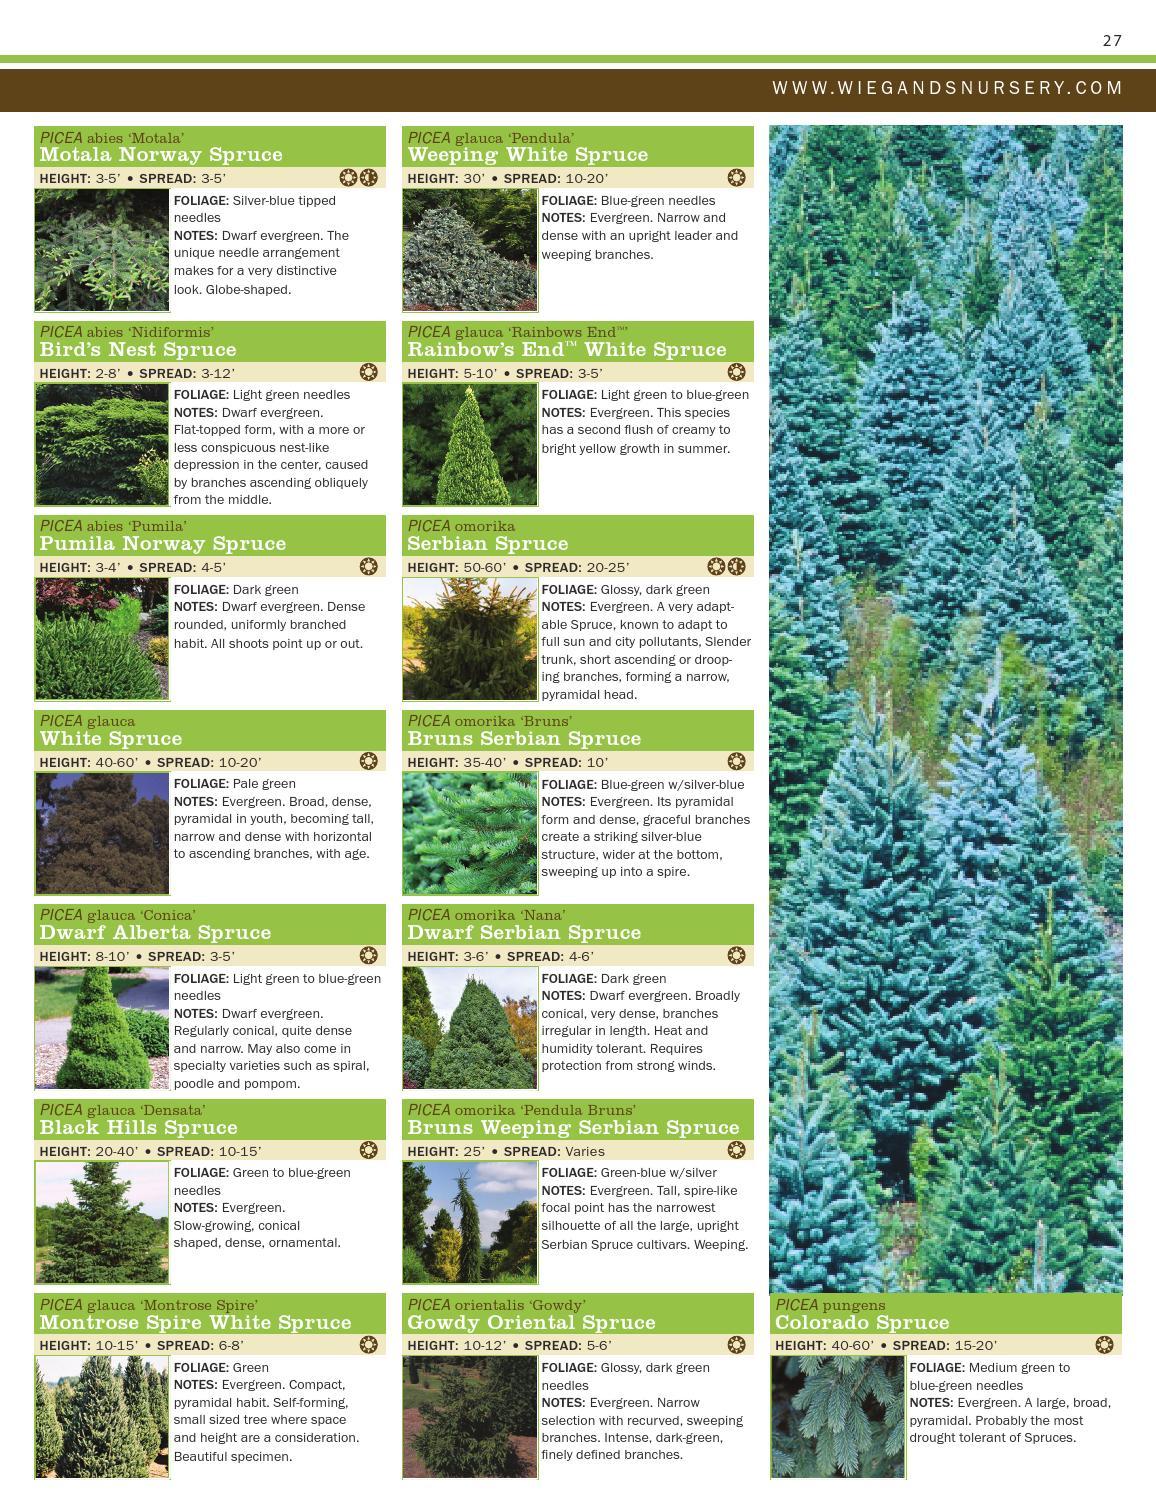 Plant Catalog By Ray Wiegands Nursery Issuu